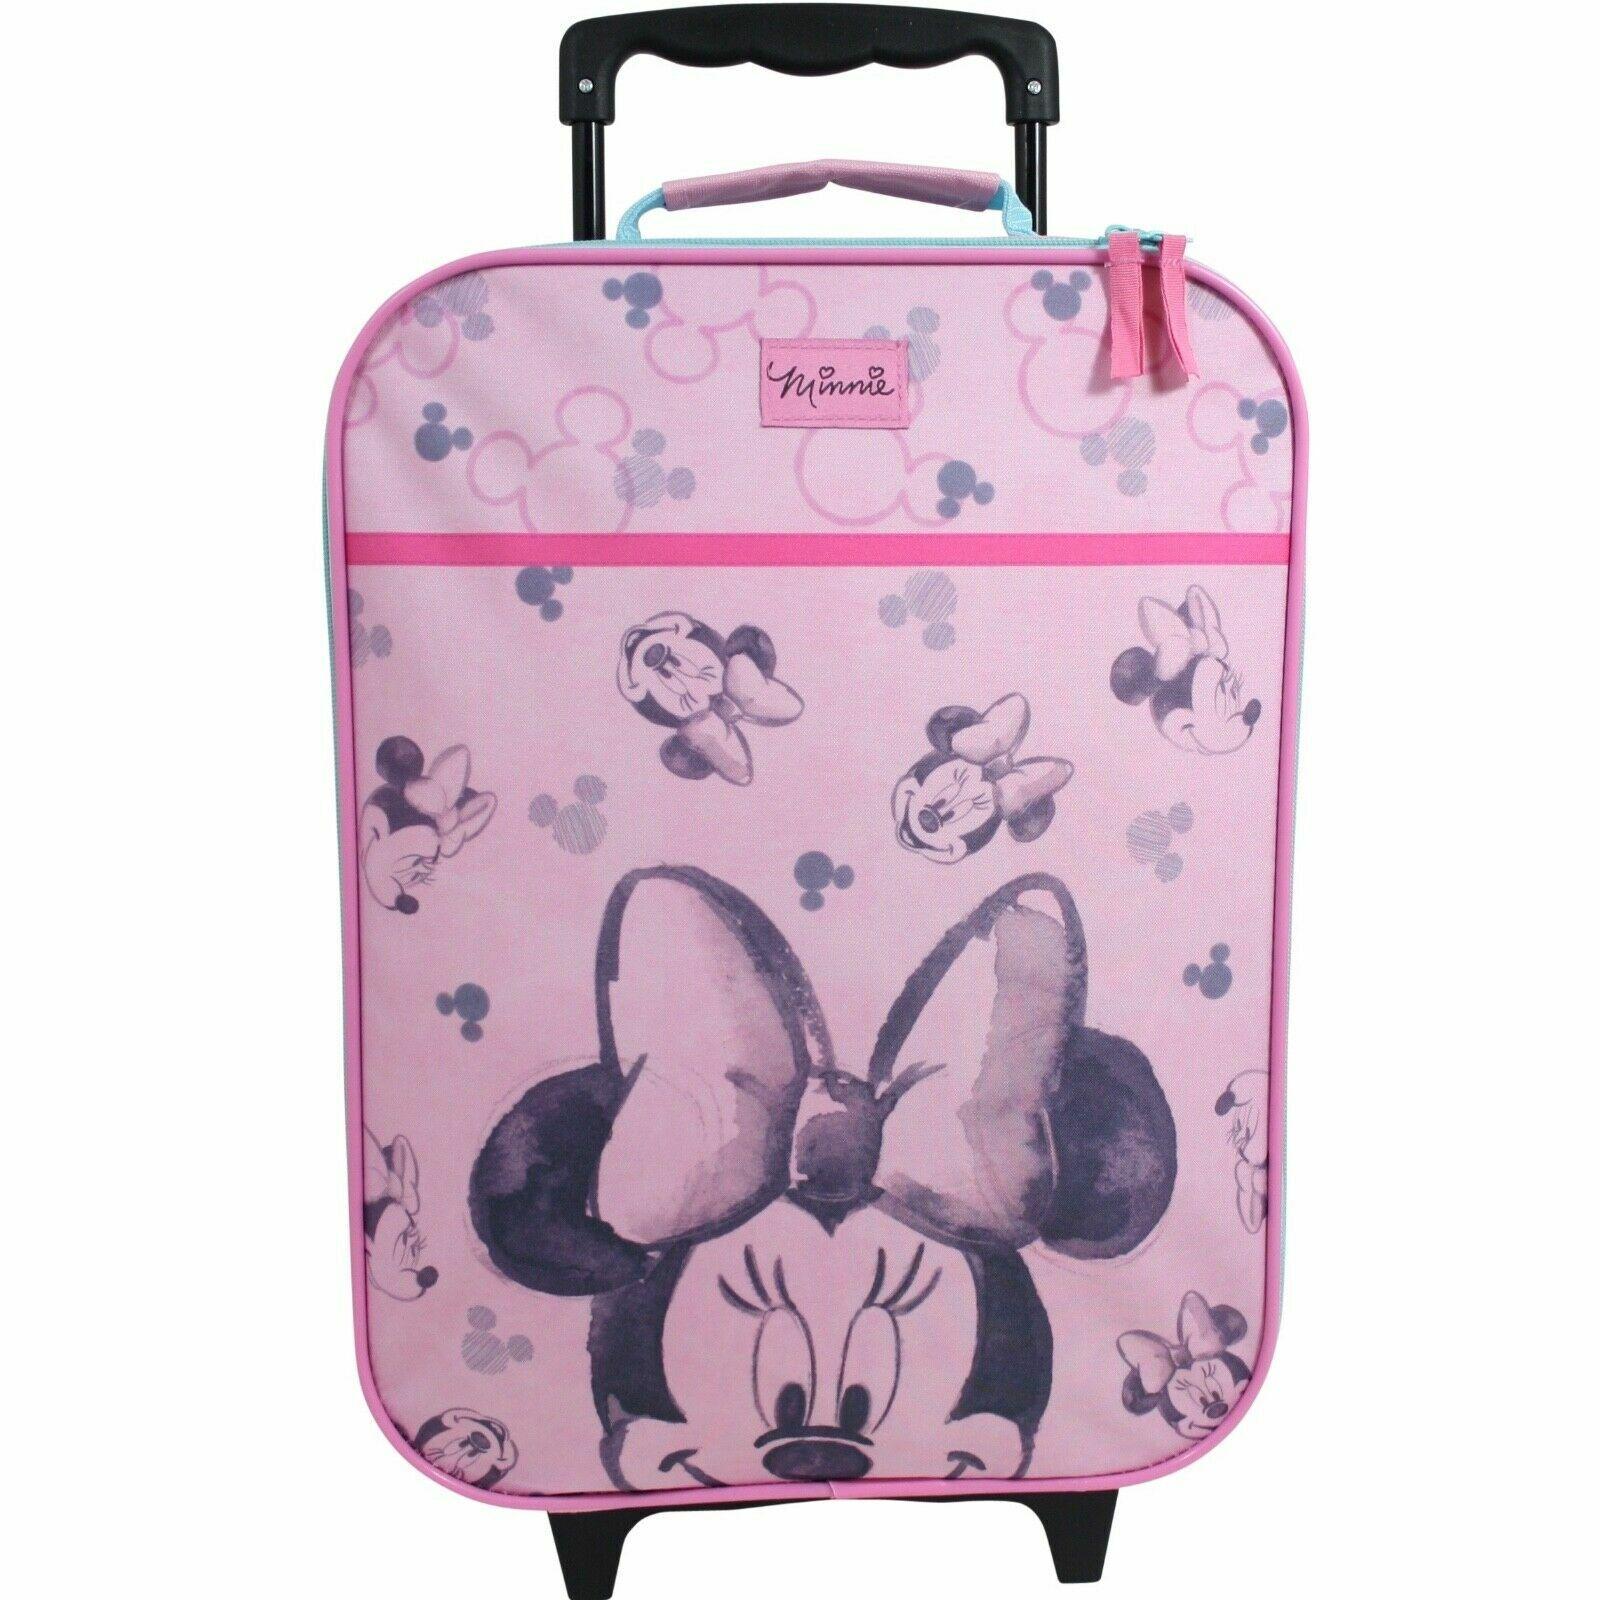 Disney Minnie Mouse Koffer Trolley Kinderkoffer Trolly Handgepäck Kinder Mädchen